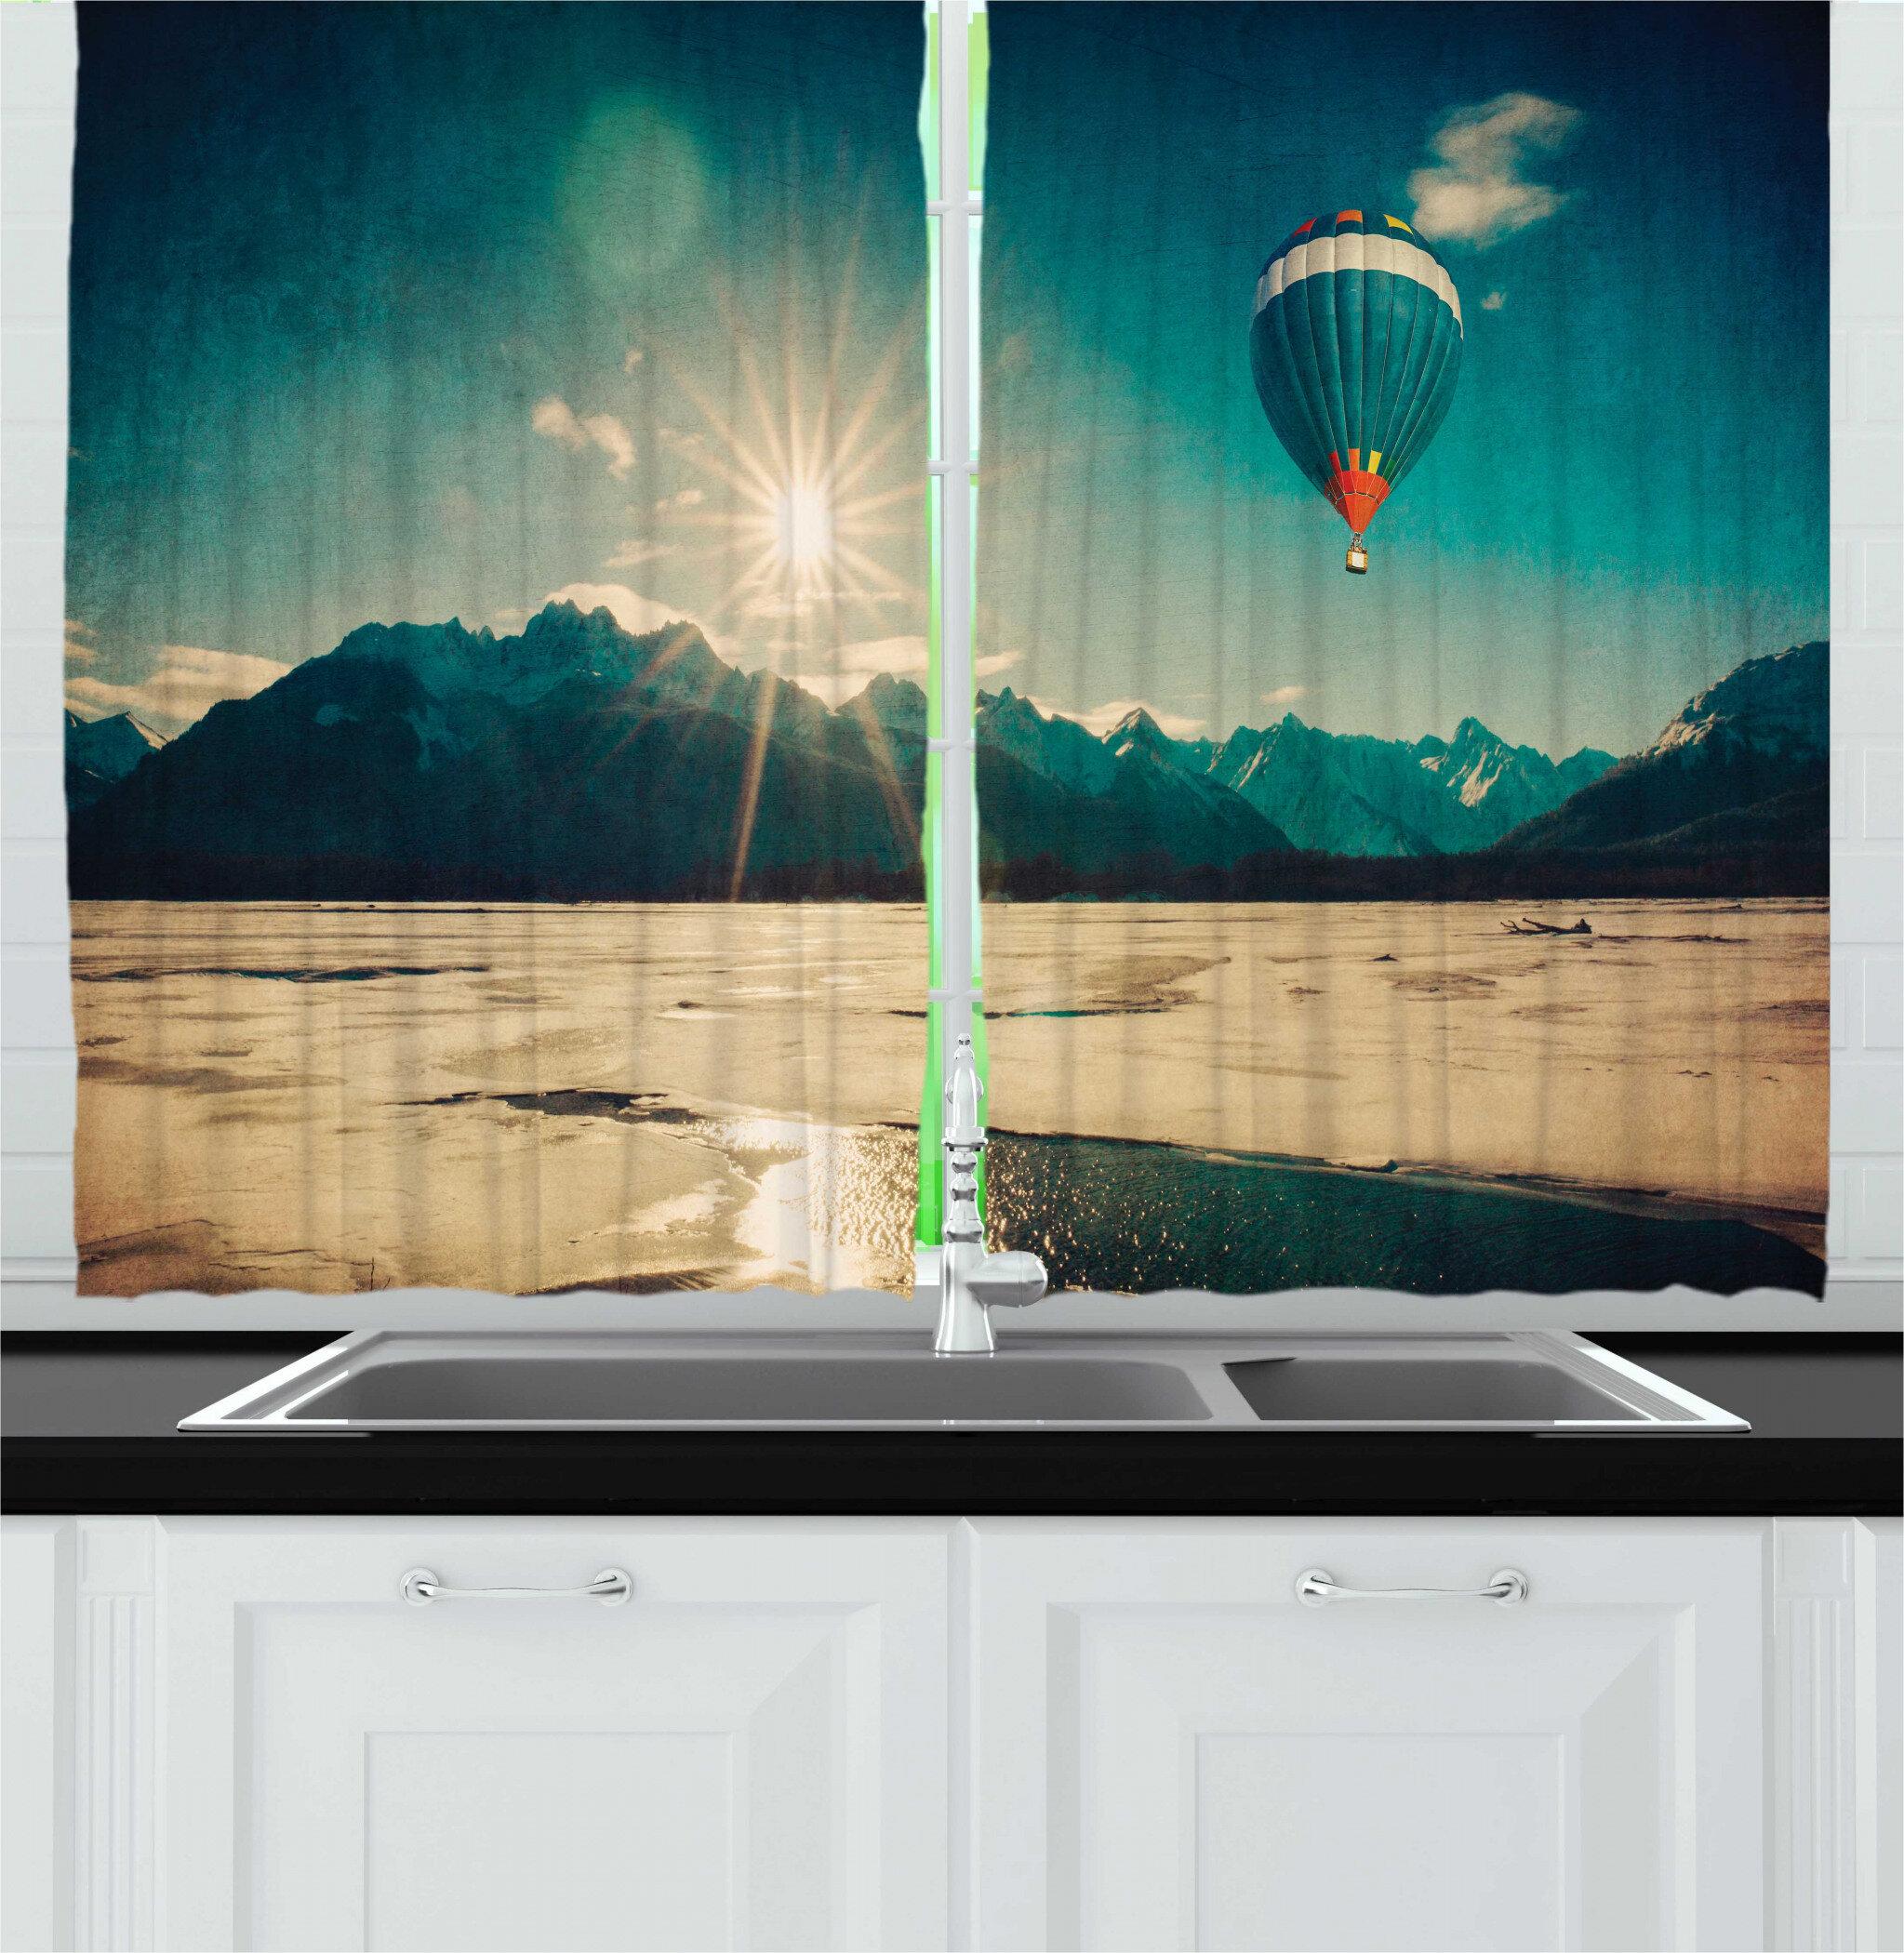 Winter Valances Kitchen Curtains You Ll Love In 2021 Wayfair